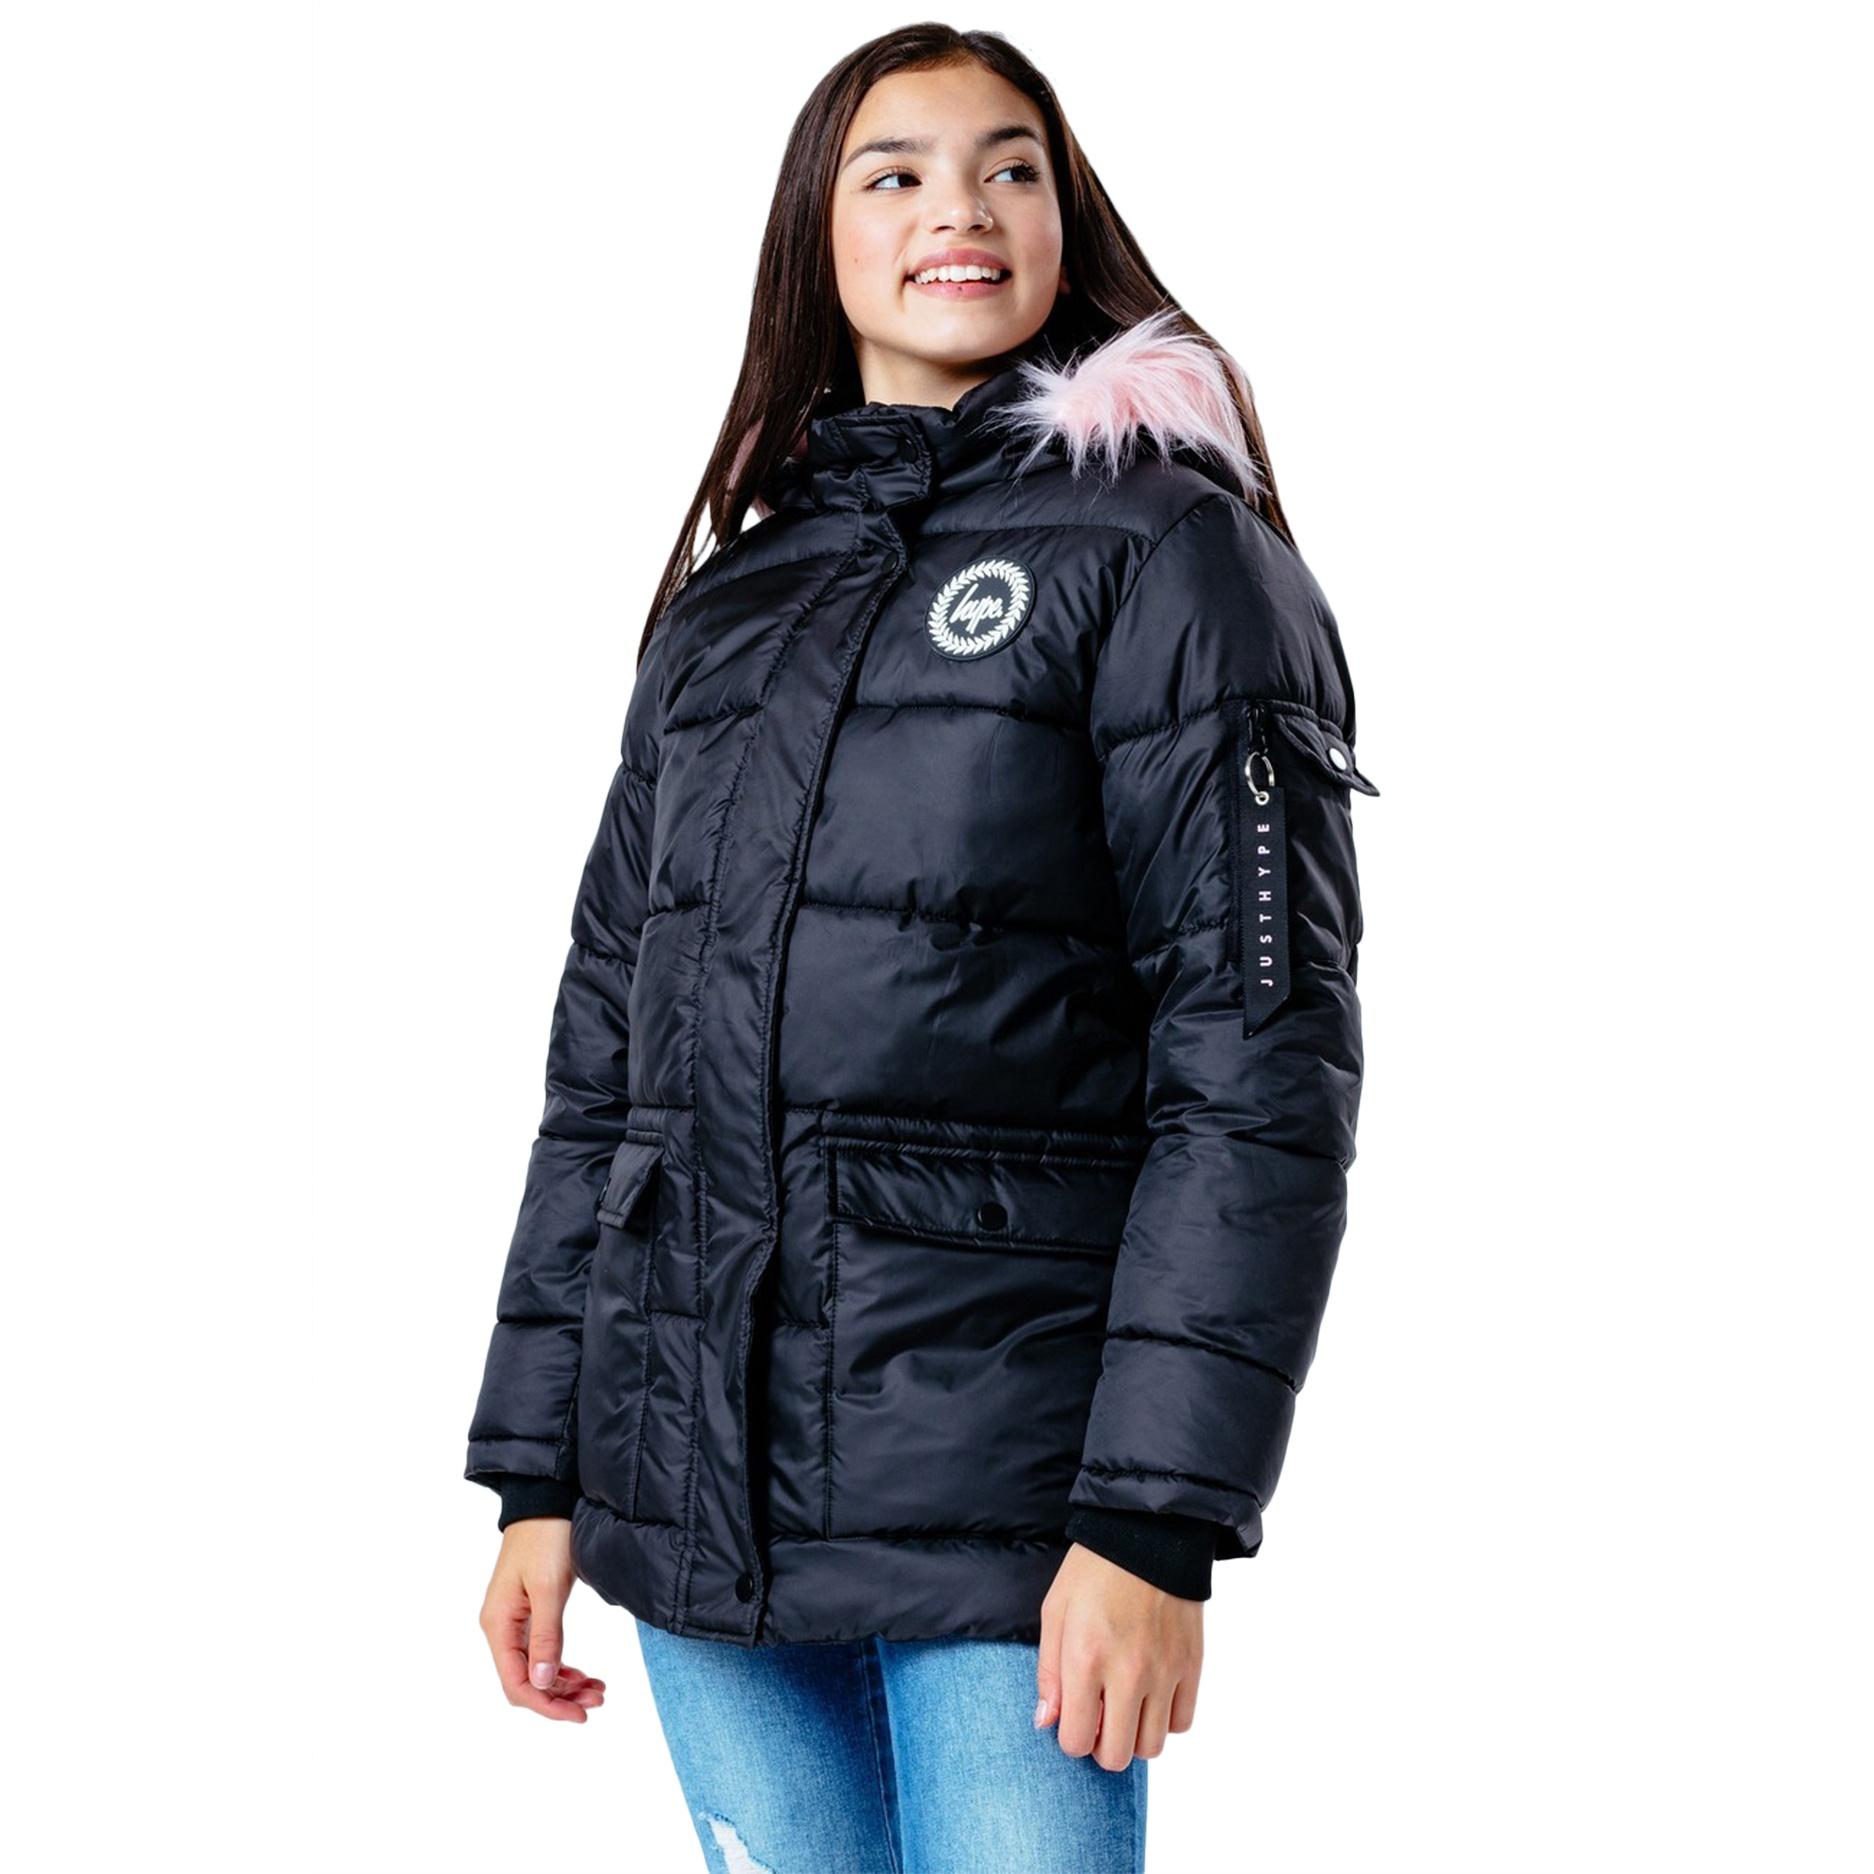 Hype Childrens/Kids Explorer Faux Fur Jacket (16 Years) (Black/Pink)